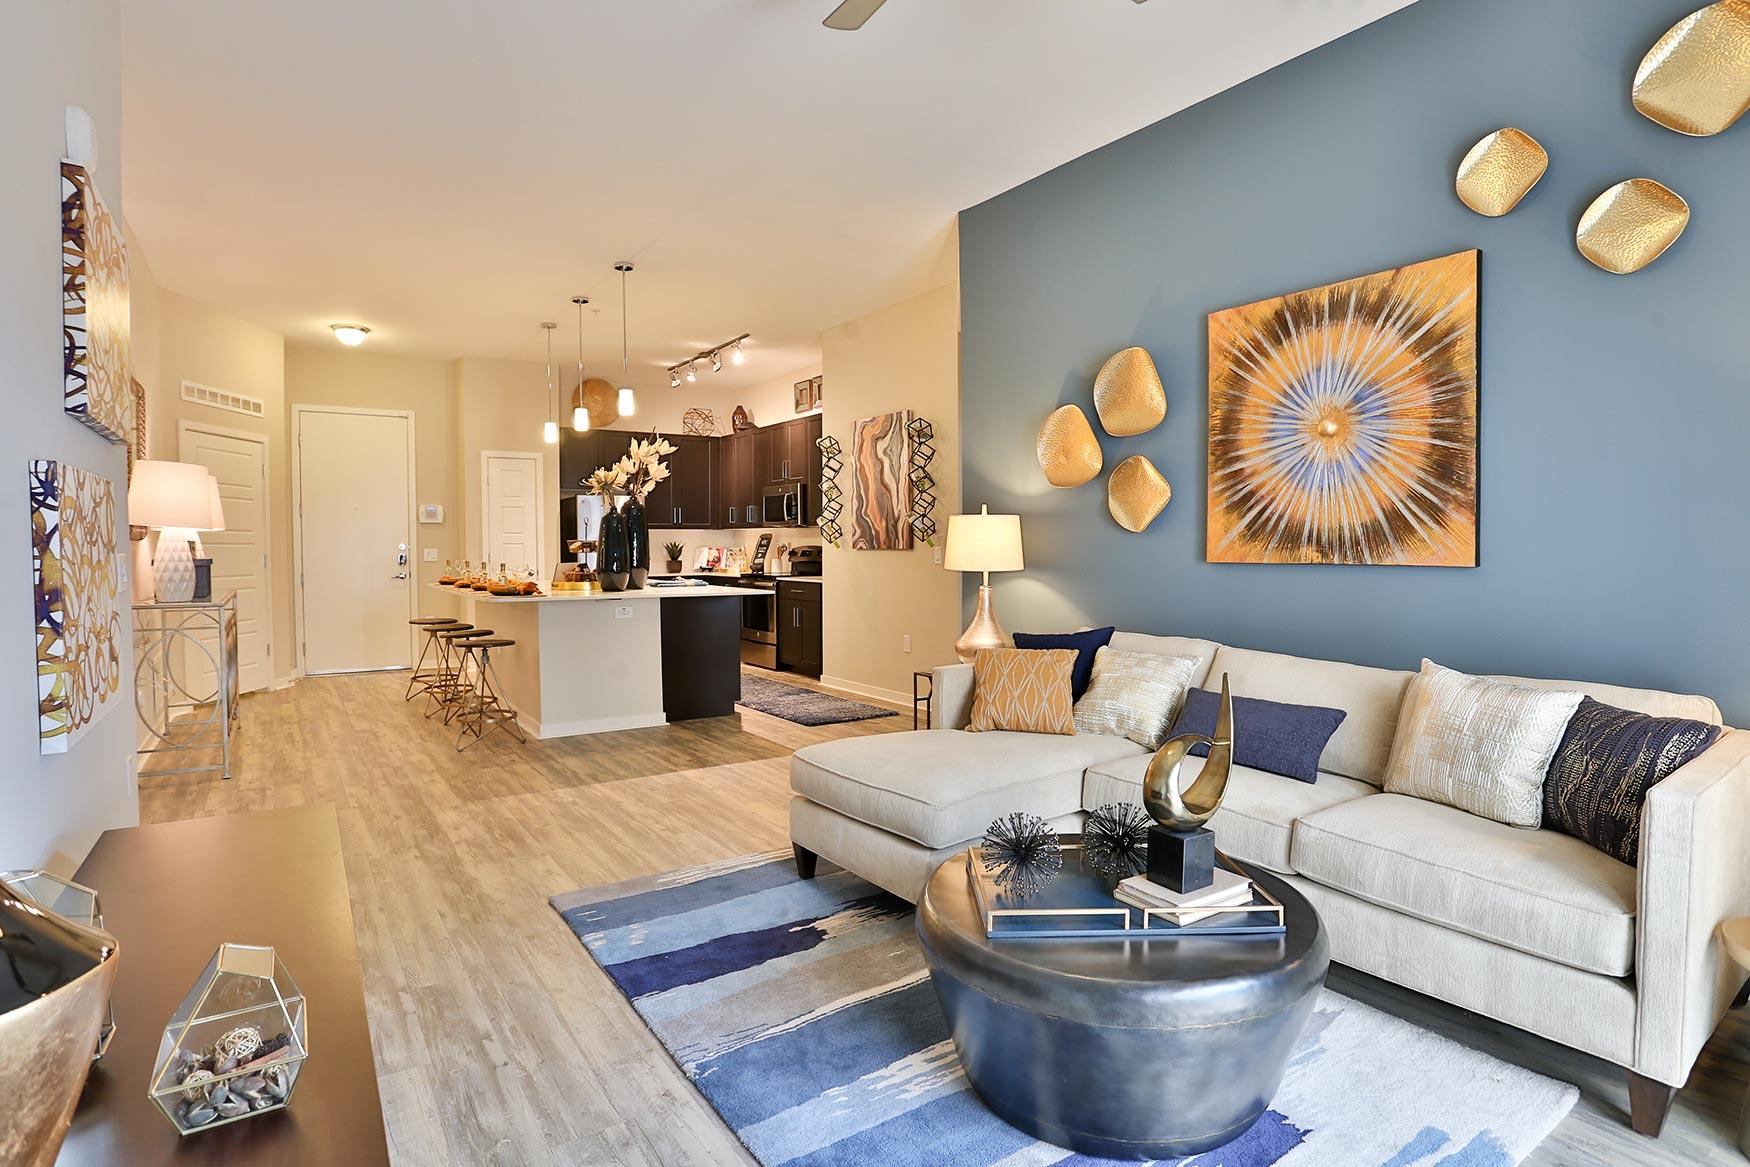 Wood Partners Announces Groundbreaking of 250-Unit Alta Wren Luxury Apartment Community in Cary, North Carolina